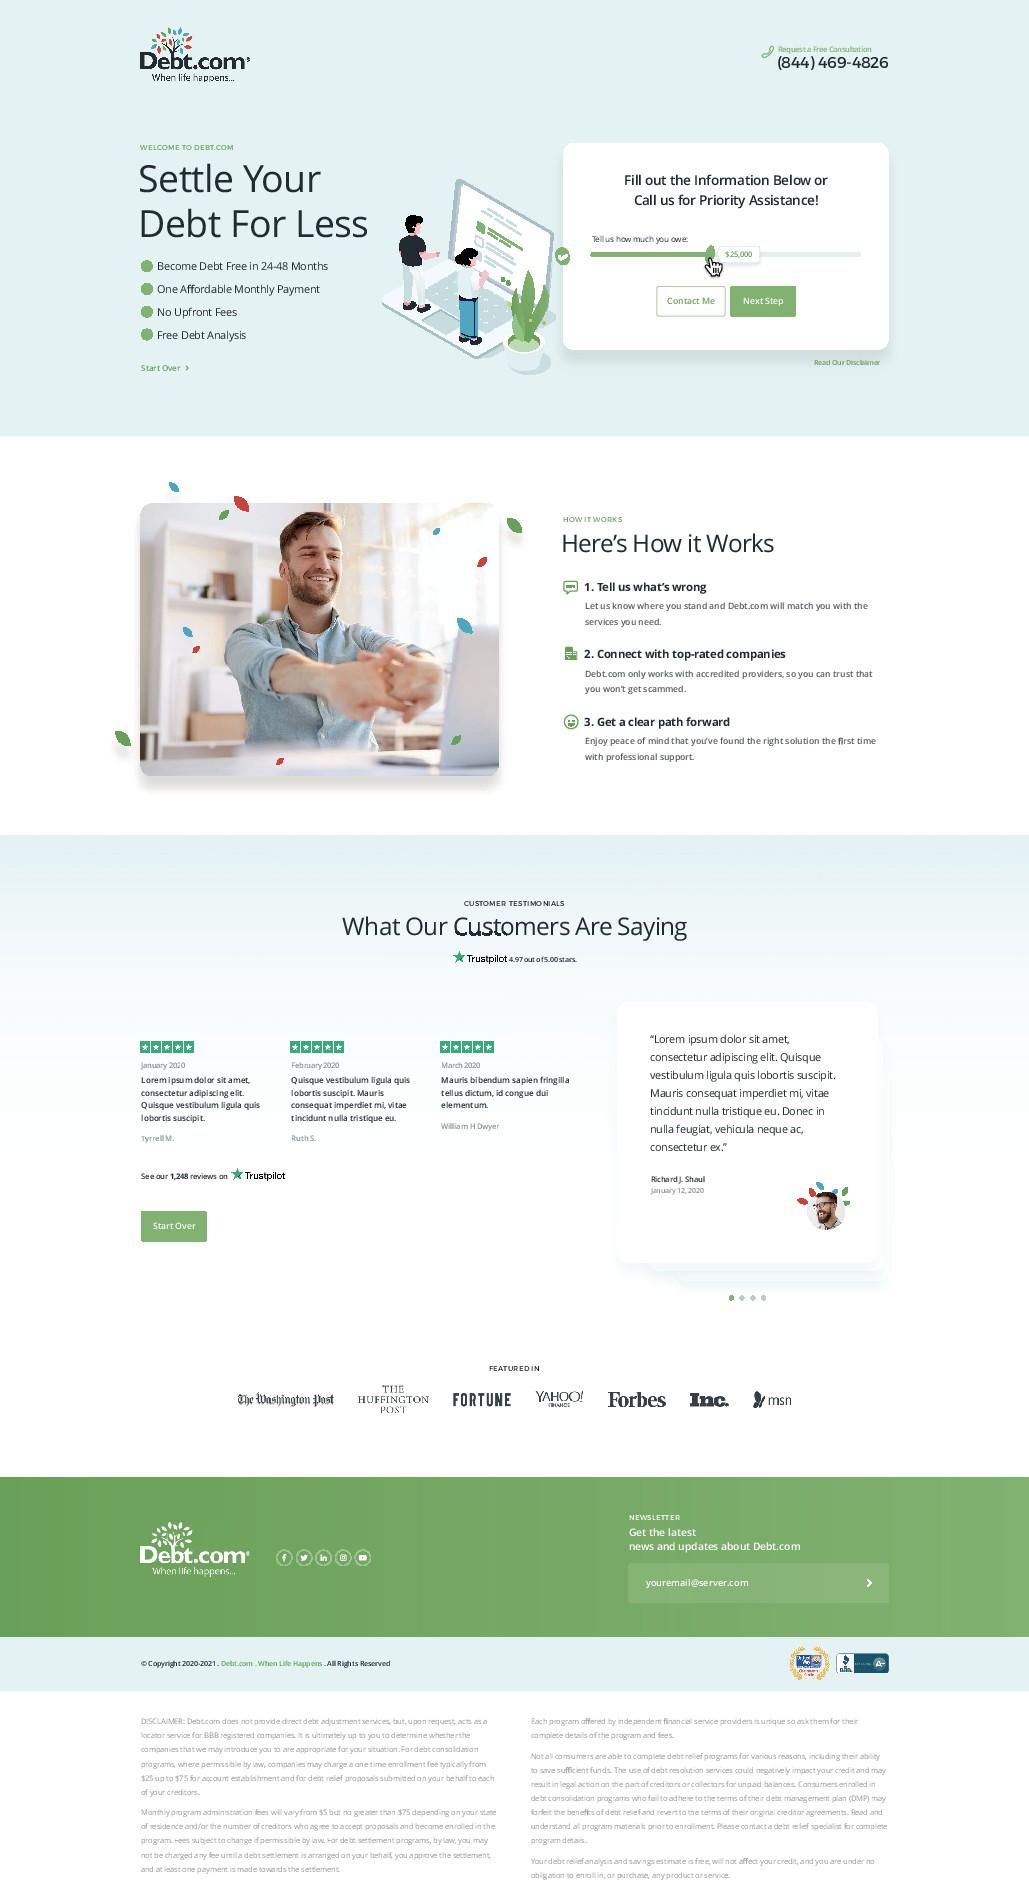 Responsive landing page design that converts